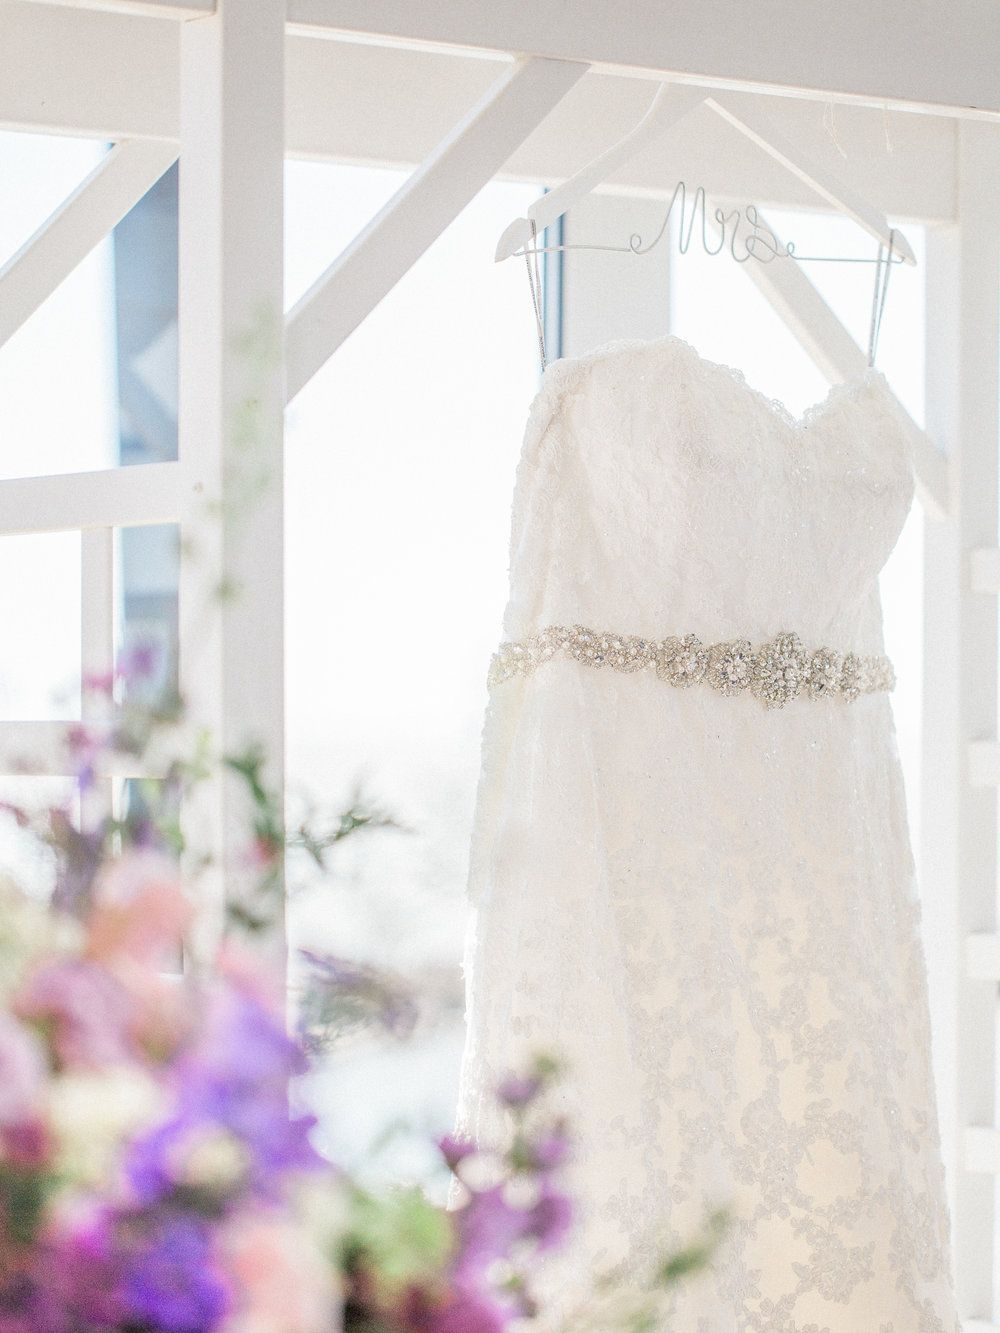 Wedding venues in virginia beach va  Silver Swan Bayside Maryland Wedding Photographers  Wedding venues